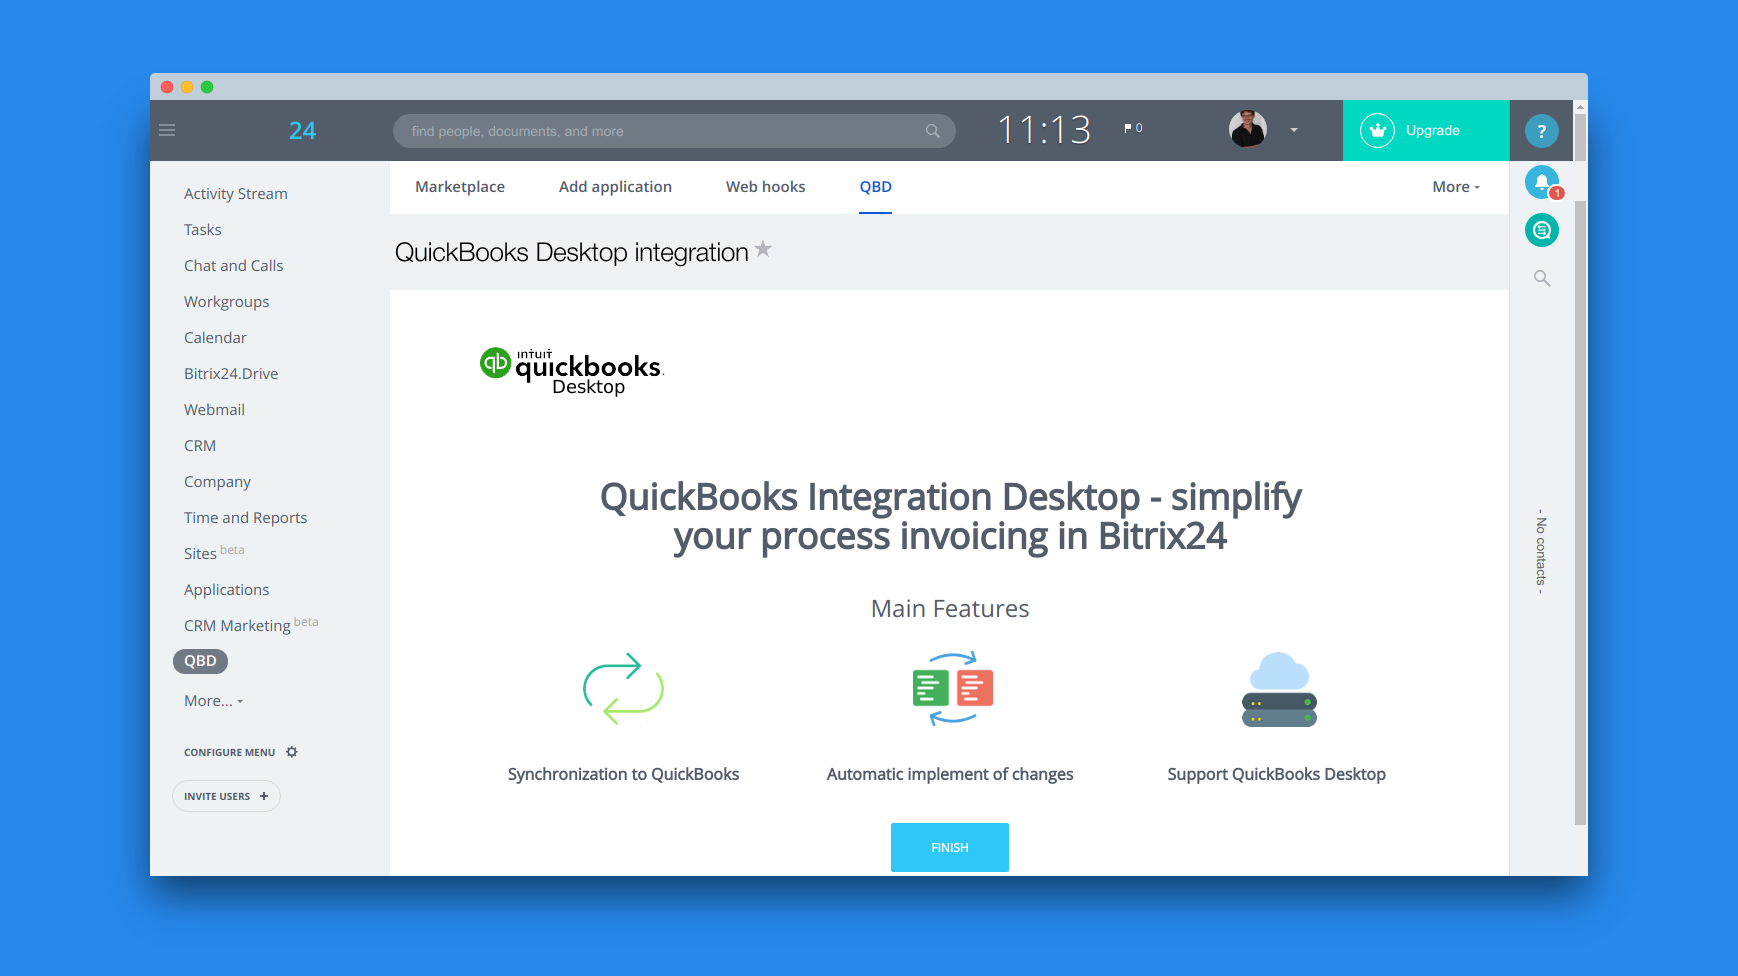 quickbook application